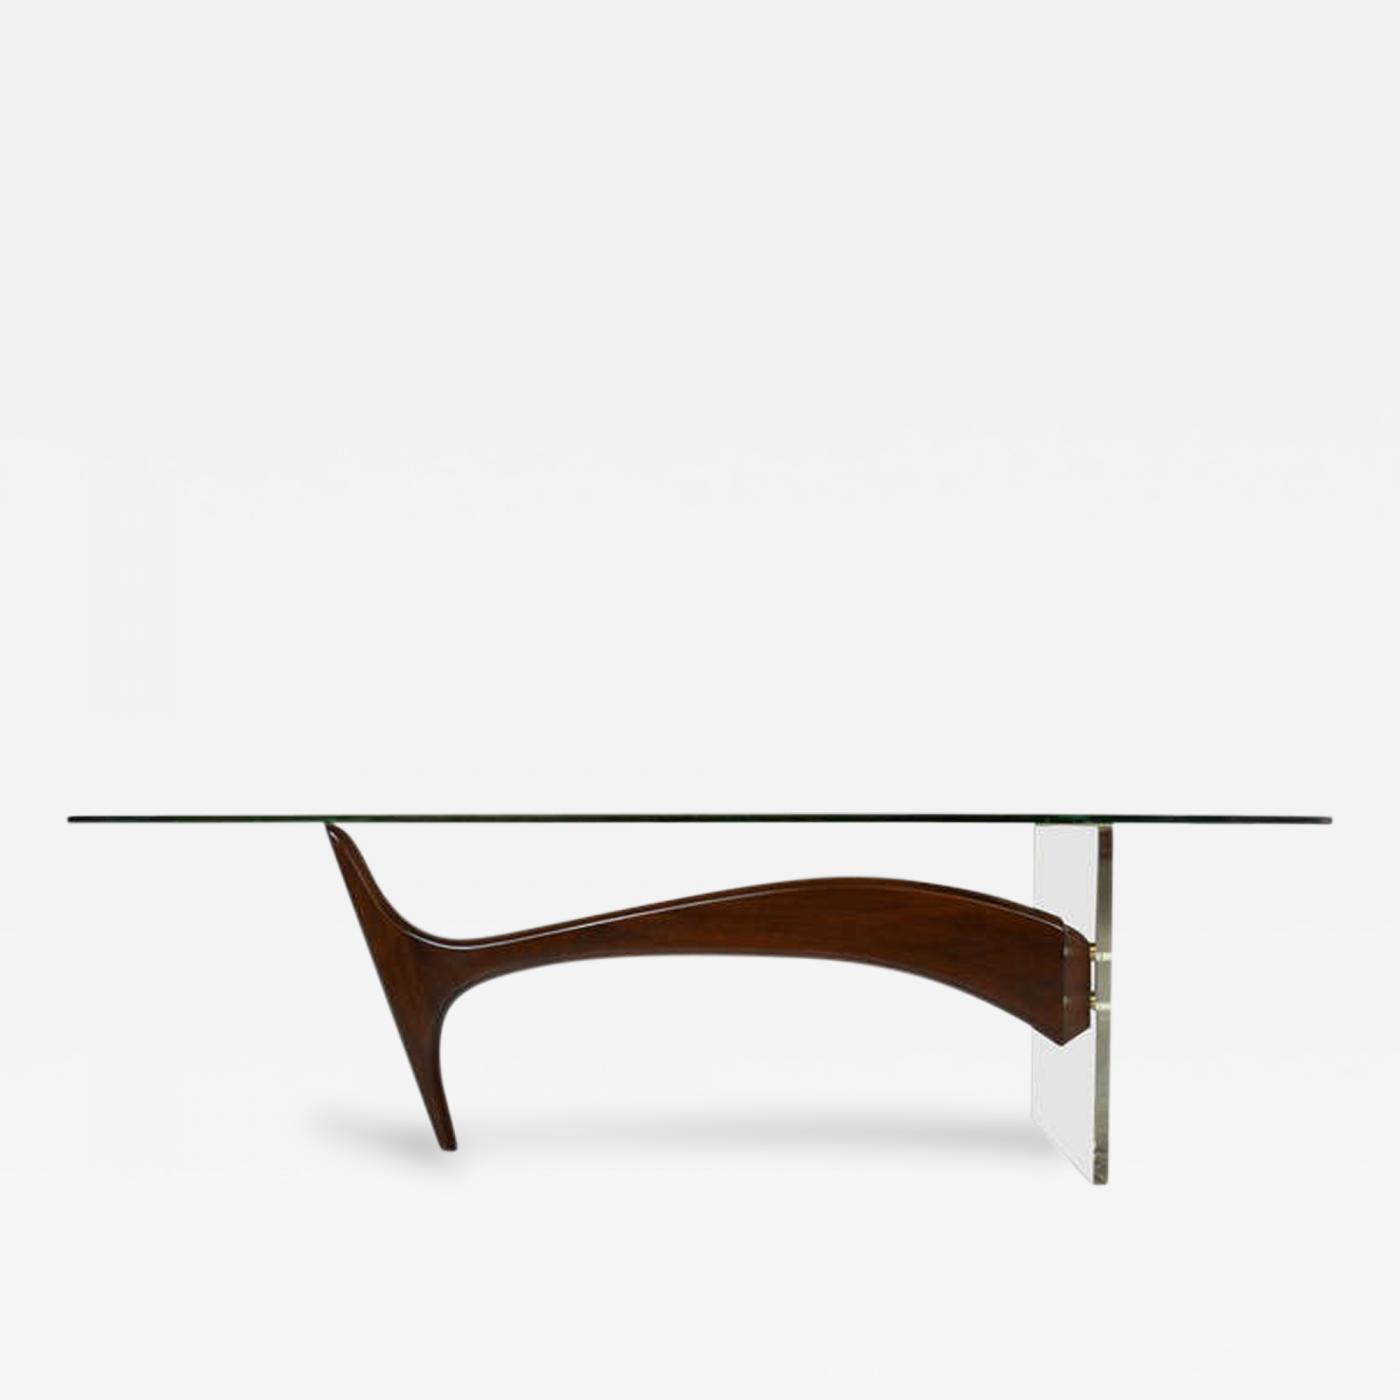 Kagan Coffee Table.Omnibus Coffee Table In The Manner Of Vladimir Kagan